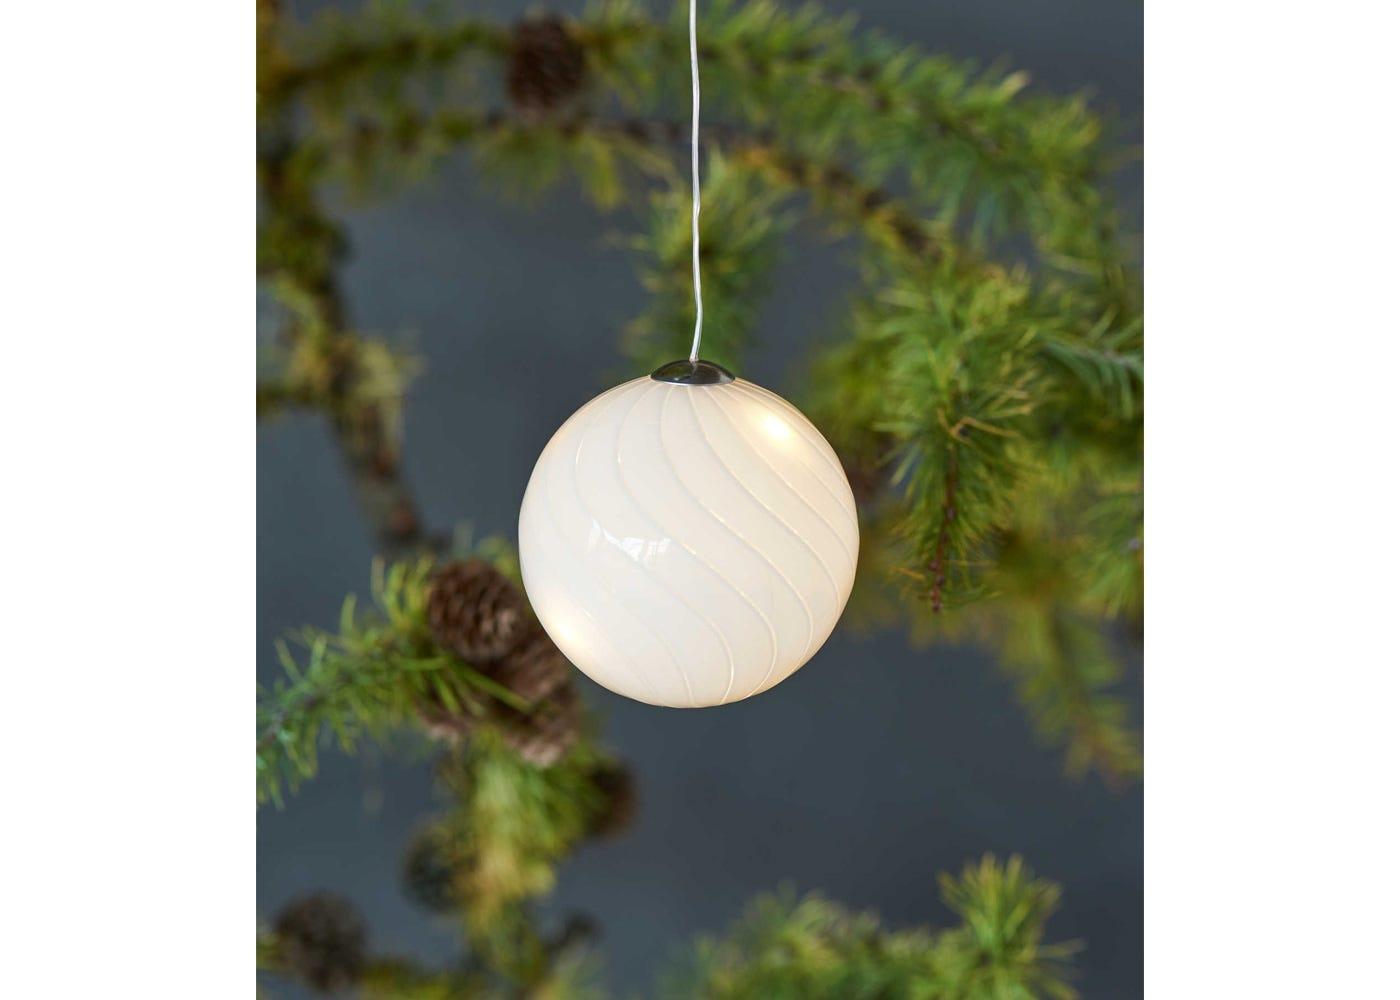 Heaven Ball 10 LED Hanging Lights 7.5cm